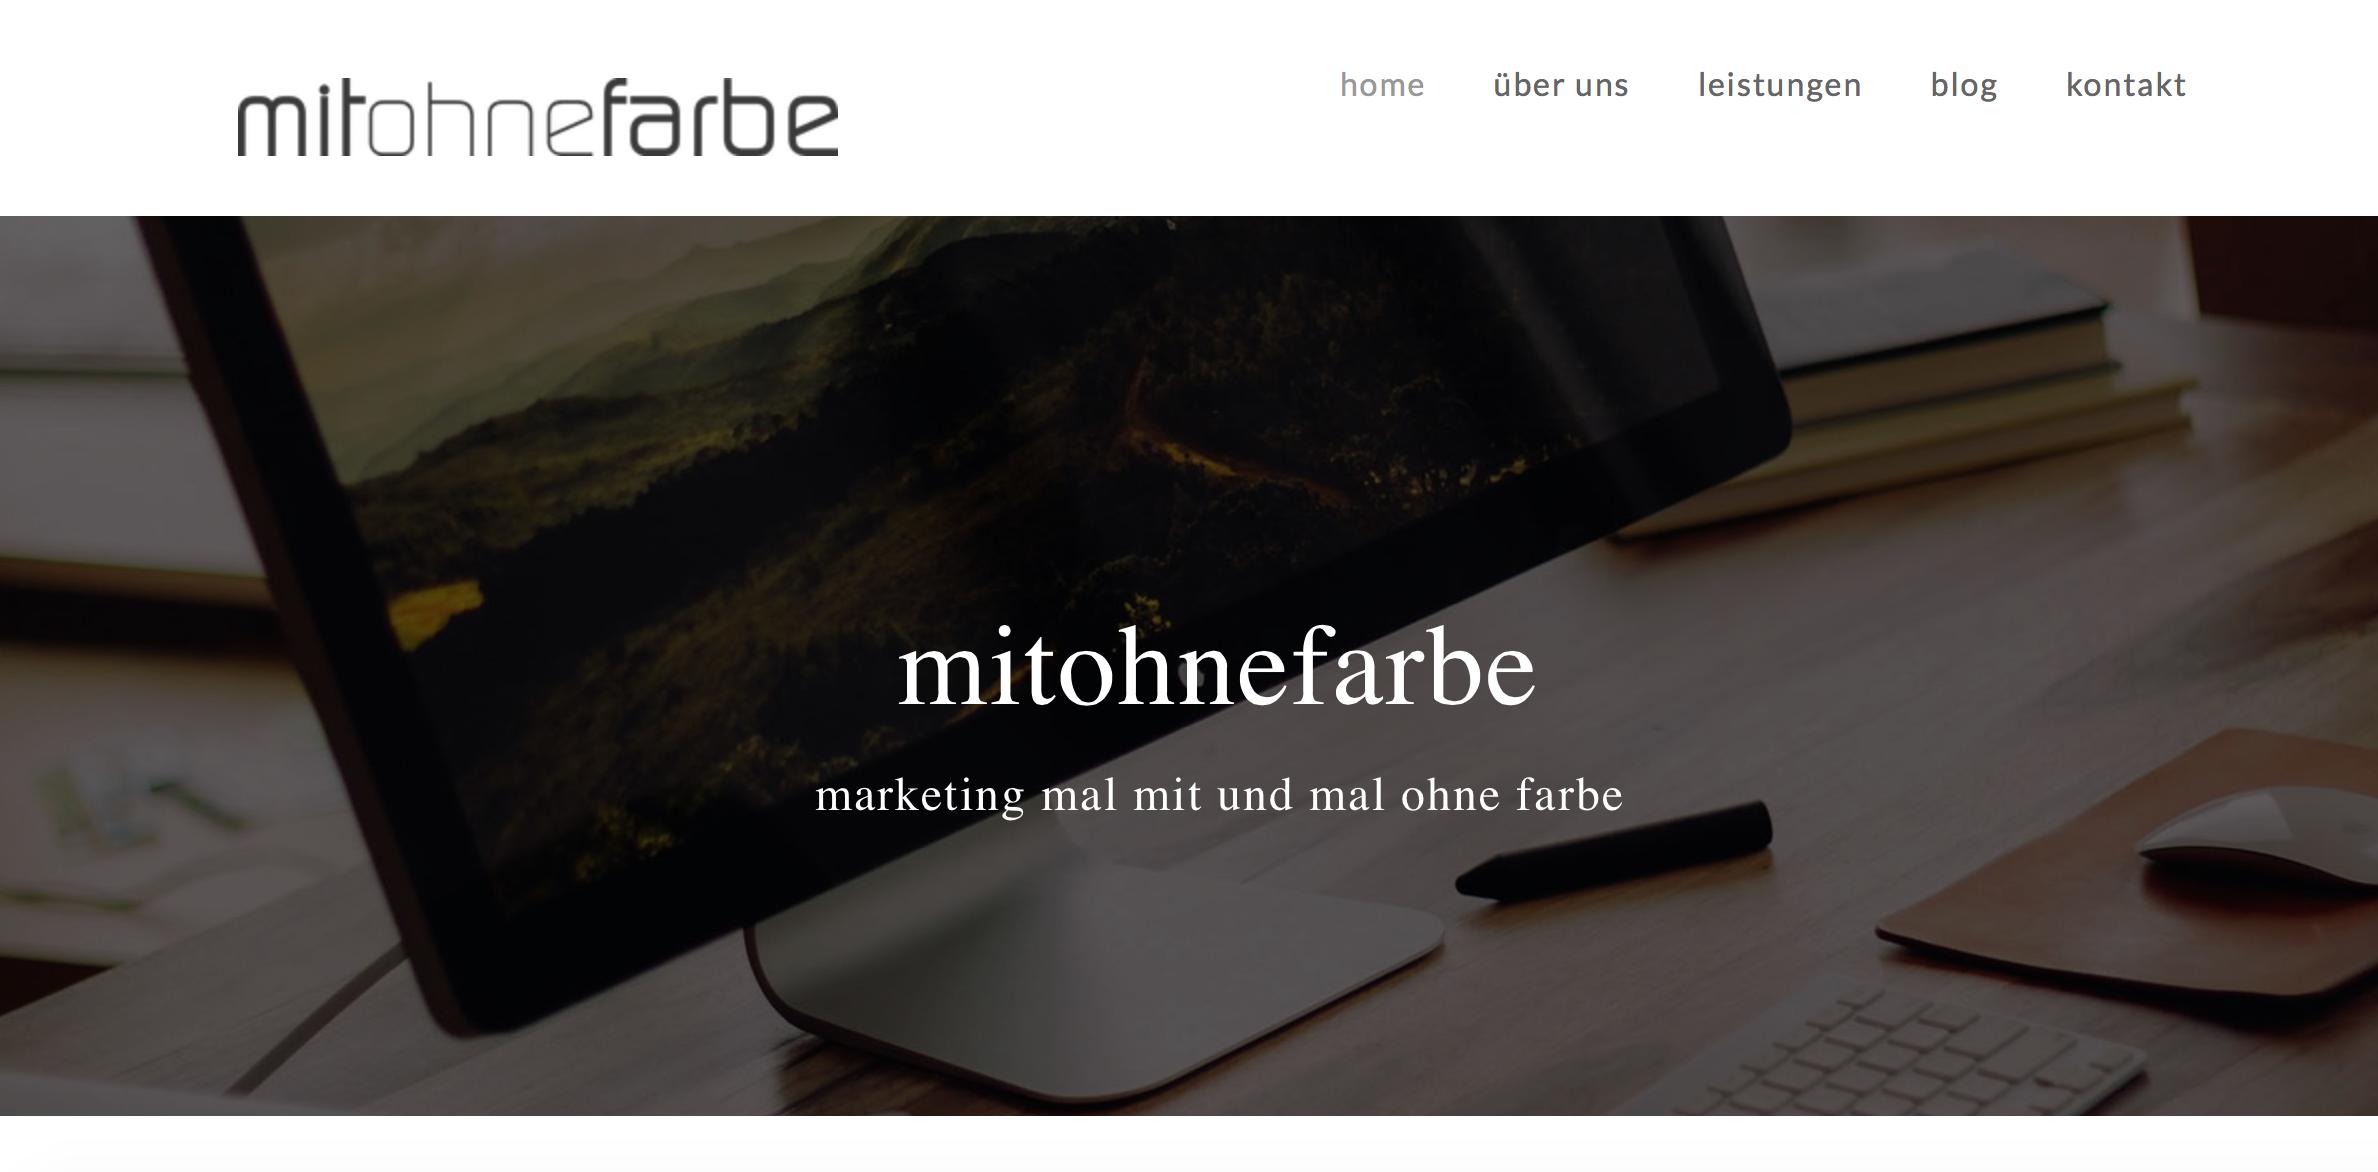 mitohnefarbe webdesign responsive social media blog wordpress eppingen